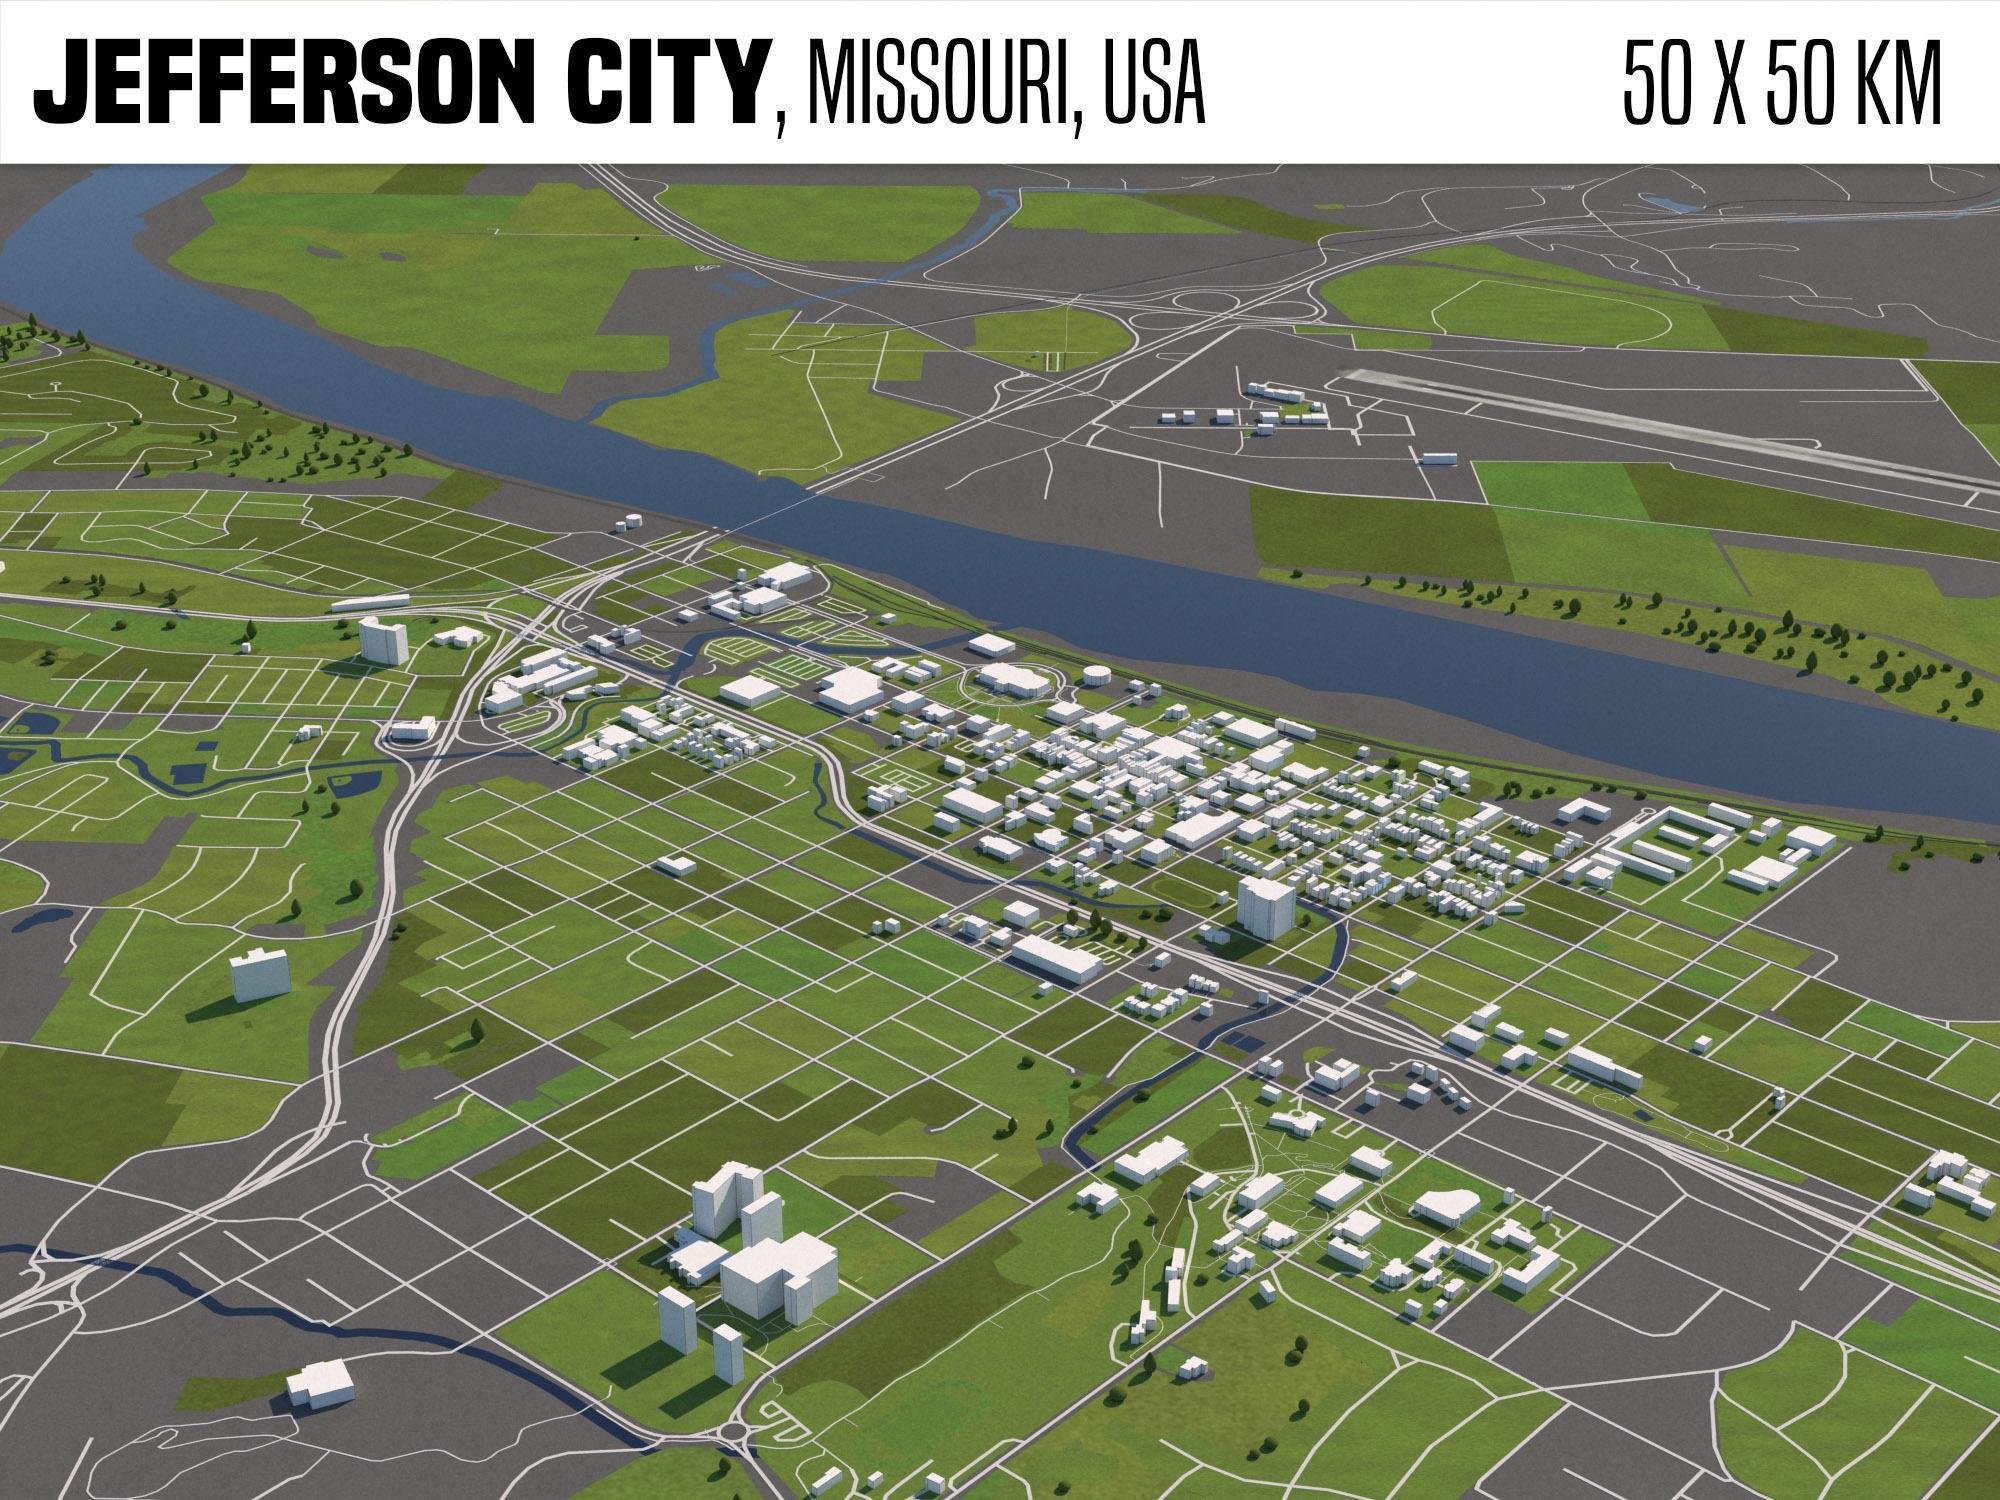 Jefferson City Missouri USA 50x50km